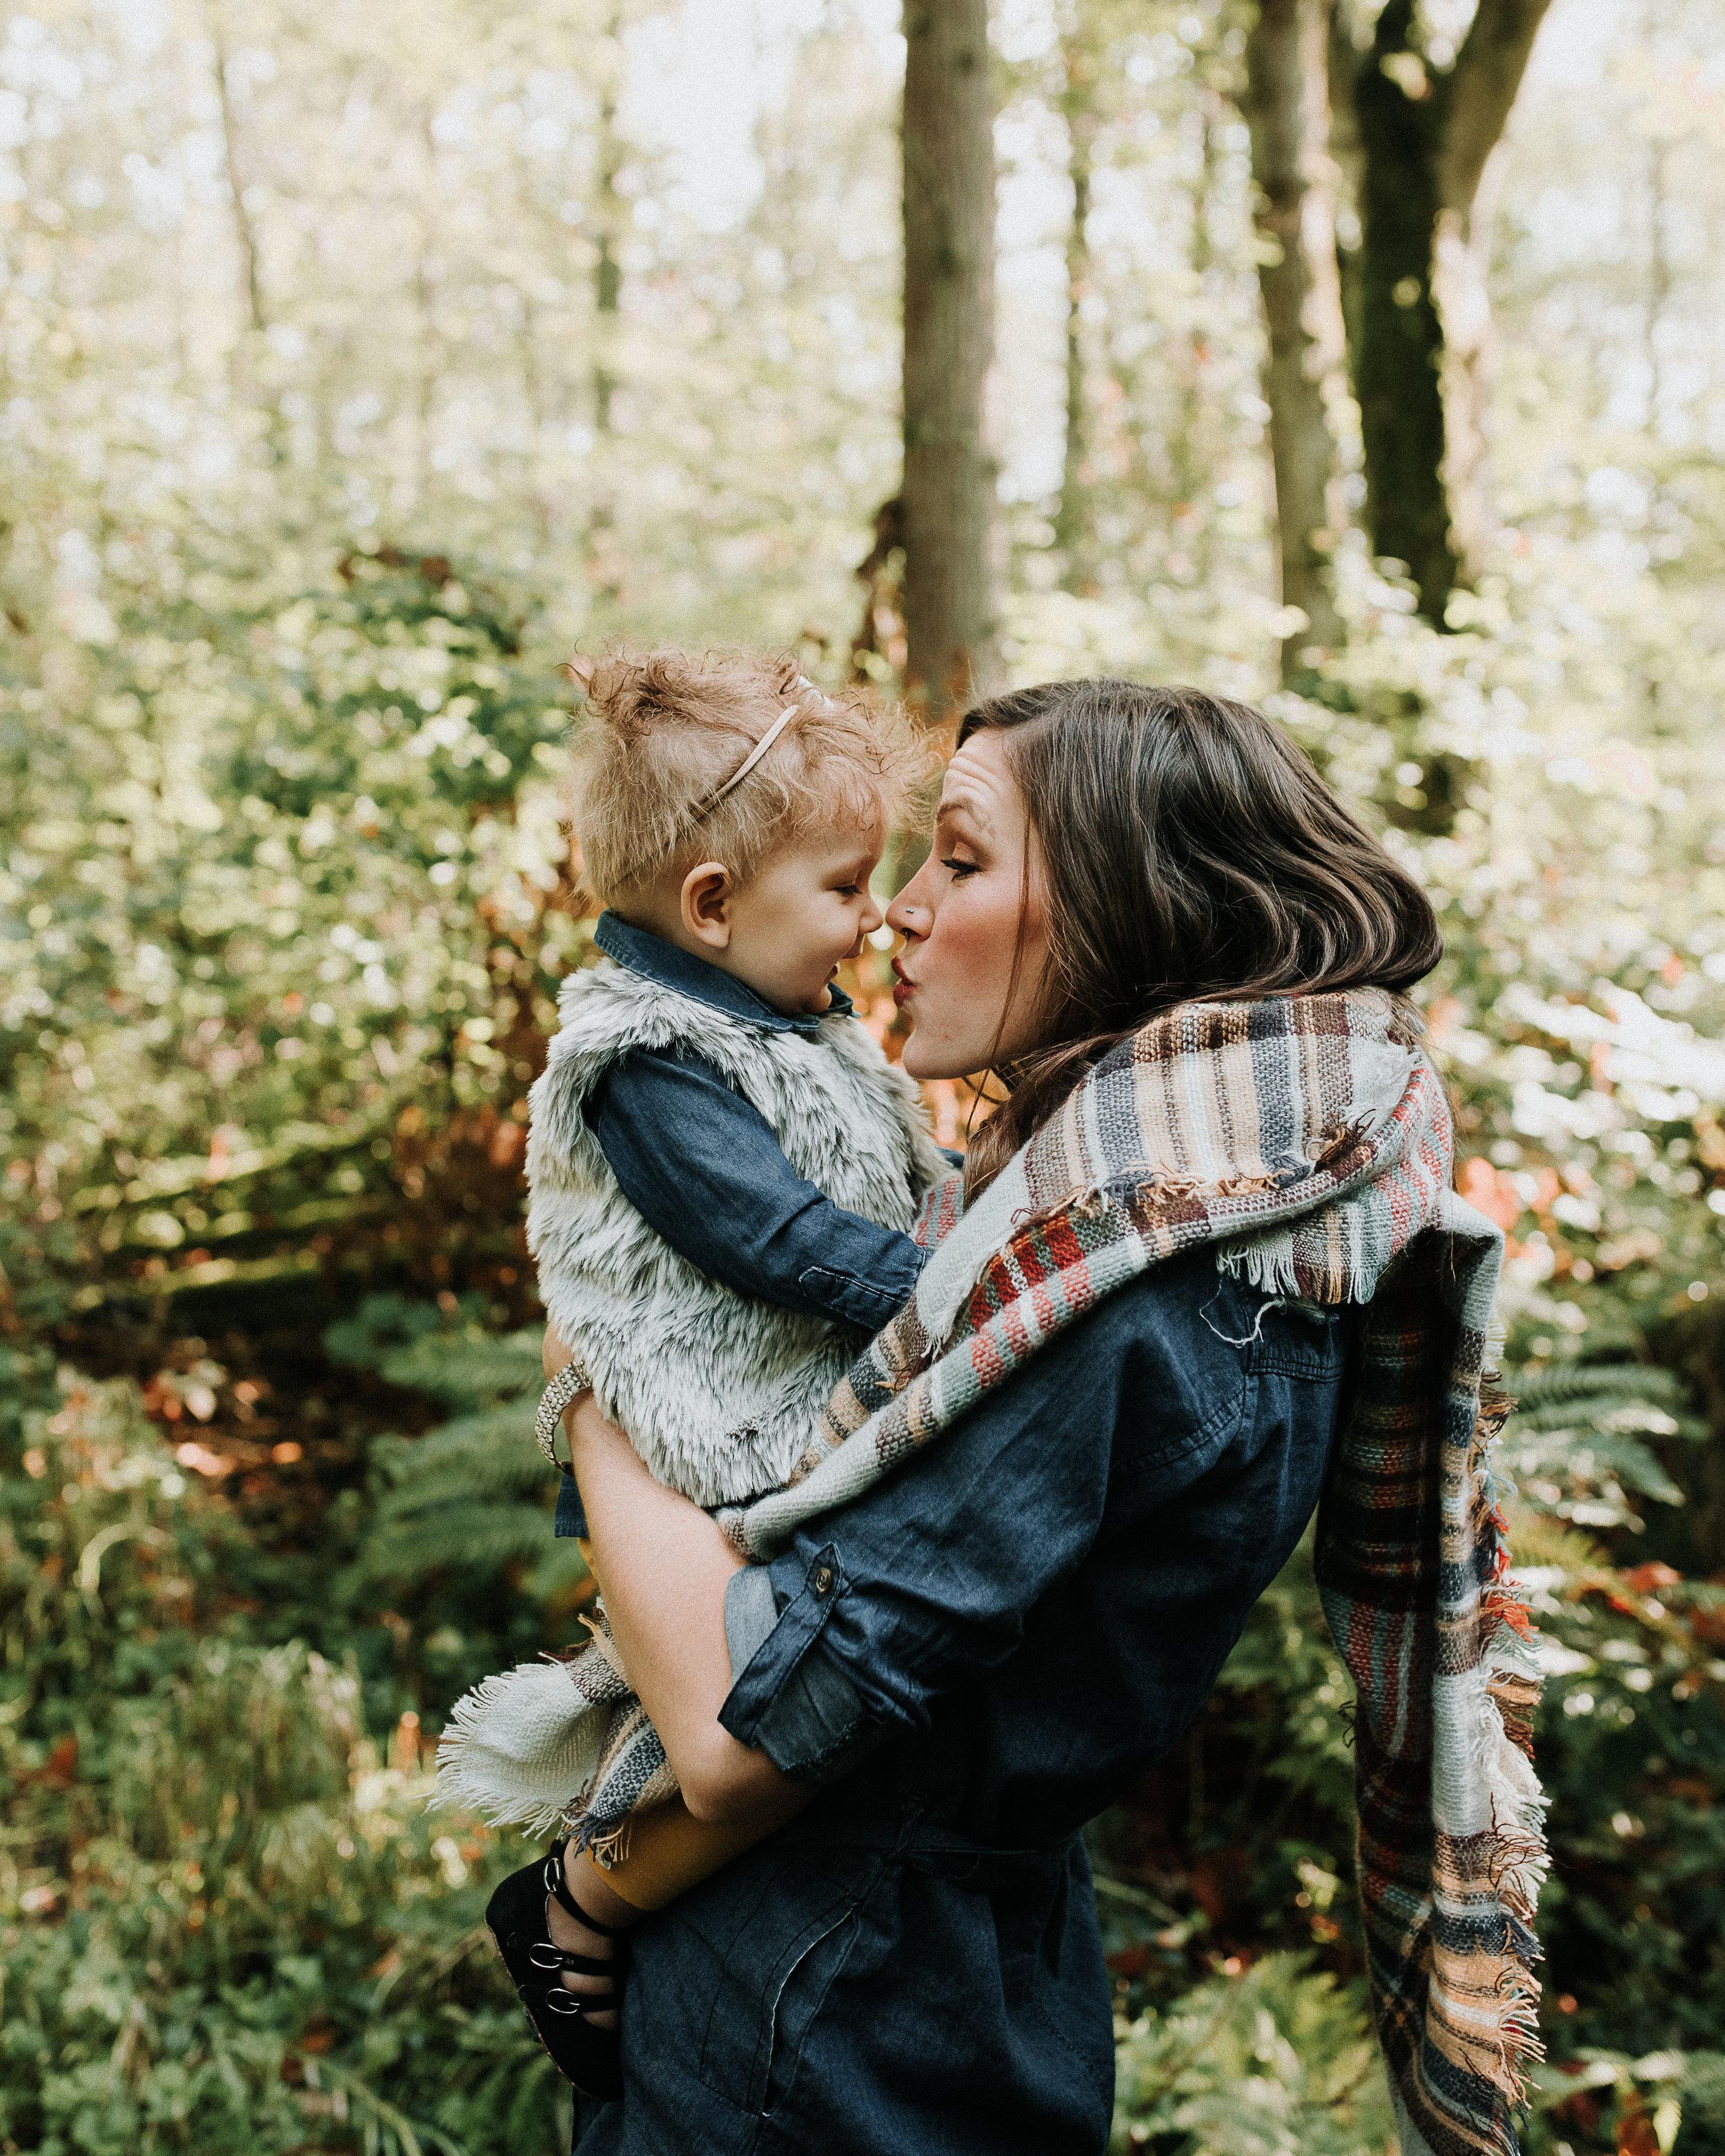 Family-Photographer-Bellingham-WA-Brianne-Bell-Photography-(Miller)36.jpg